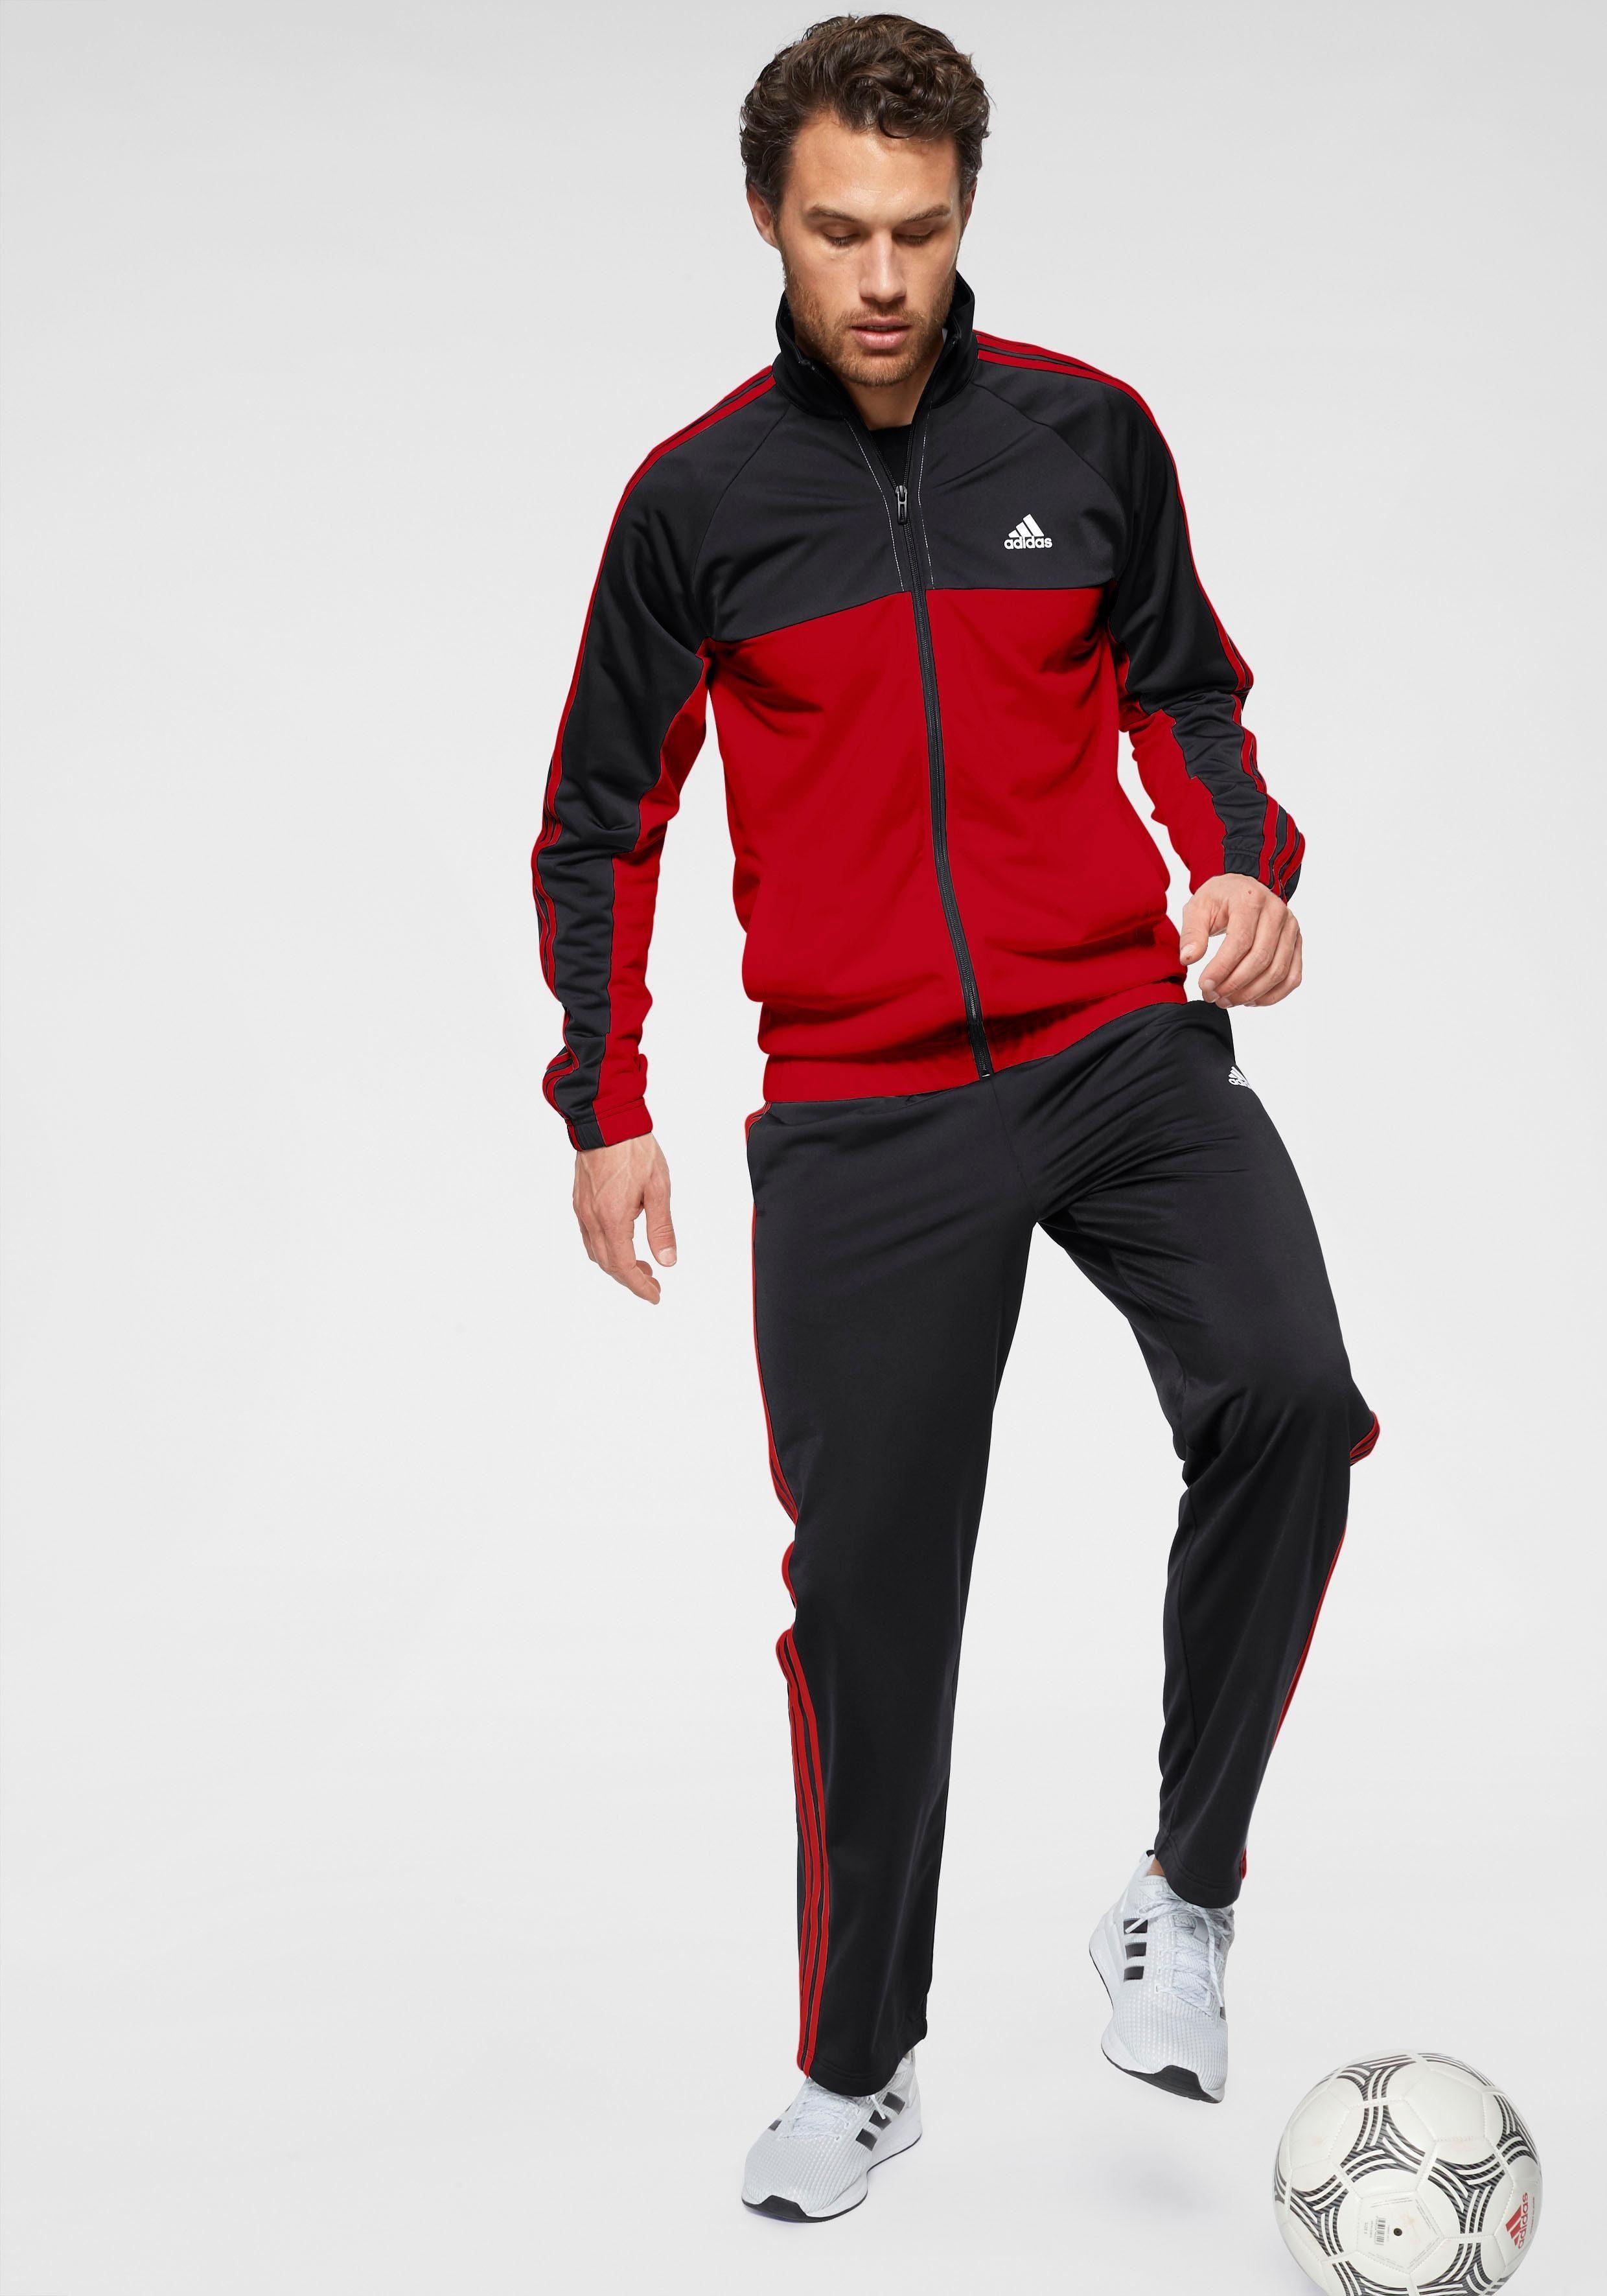 adidas Performance Trainingsanzug OSR P 3 STRIPES TRACKSUIT schwarz Herren